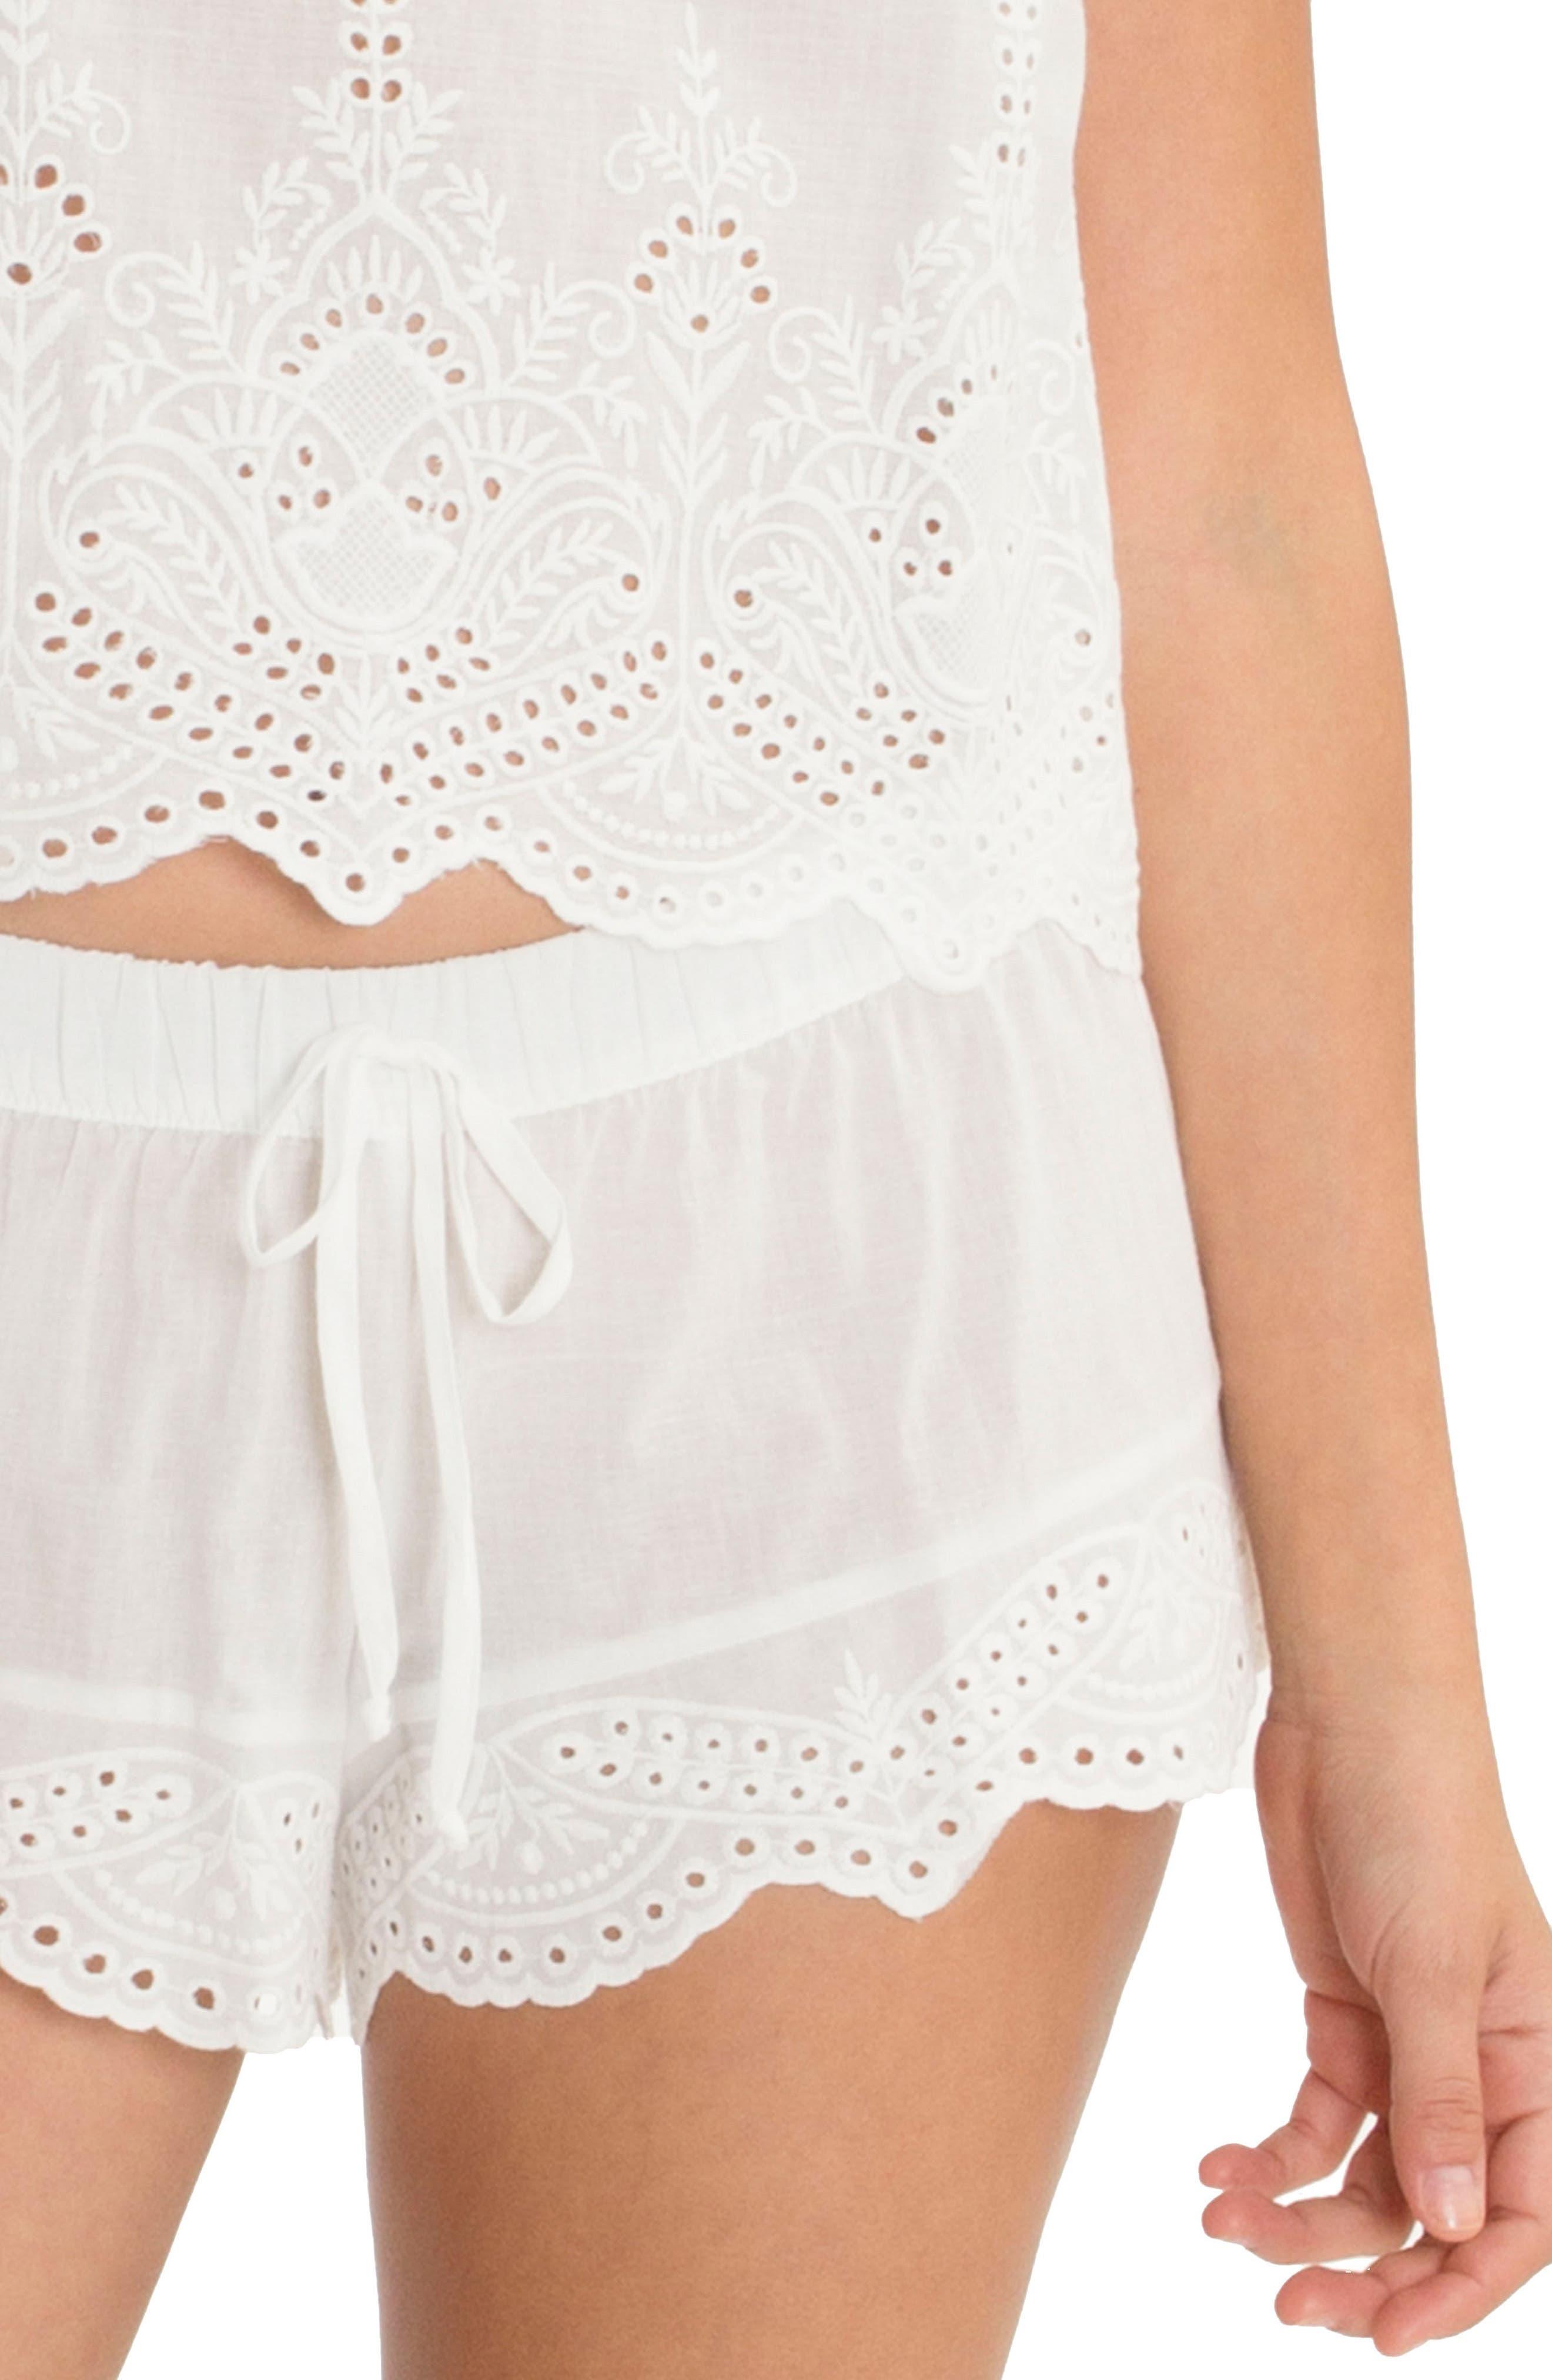 Eyelet Cotton Short Pajamas,                             Alternate thumbnail 4, color,                             900